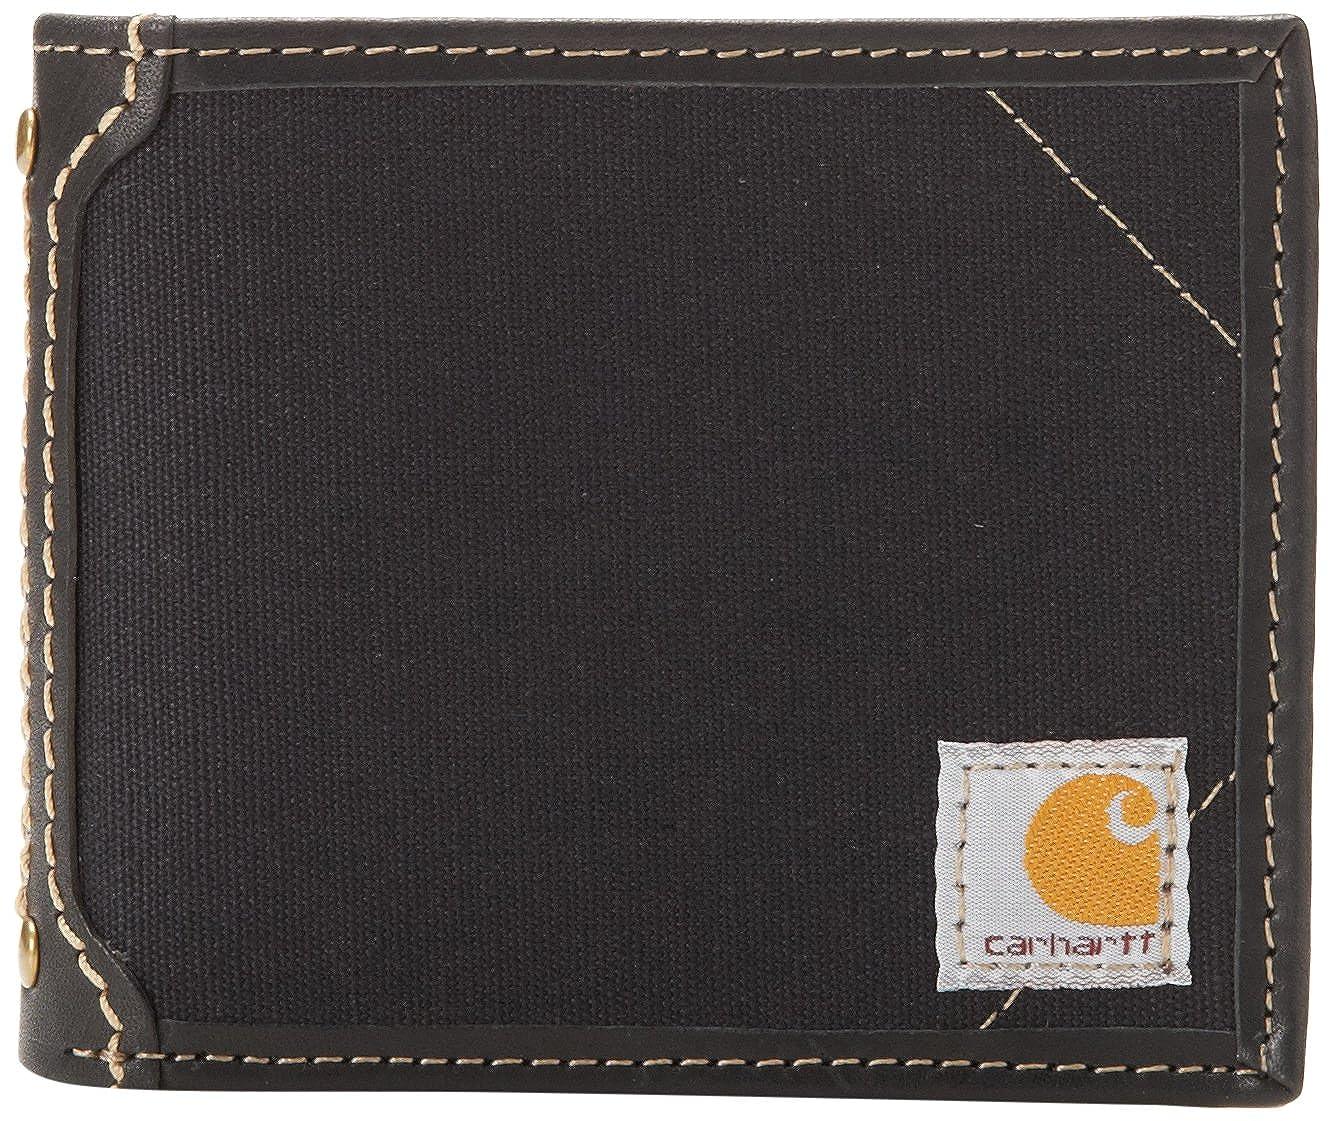 33f05be56052 Carhartt Men s Canvas Passcase Wallet